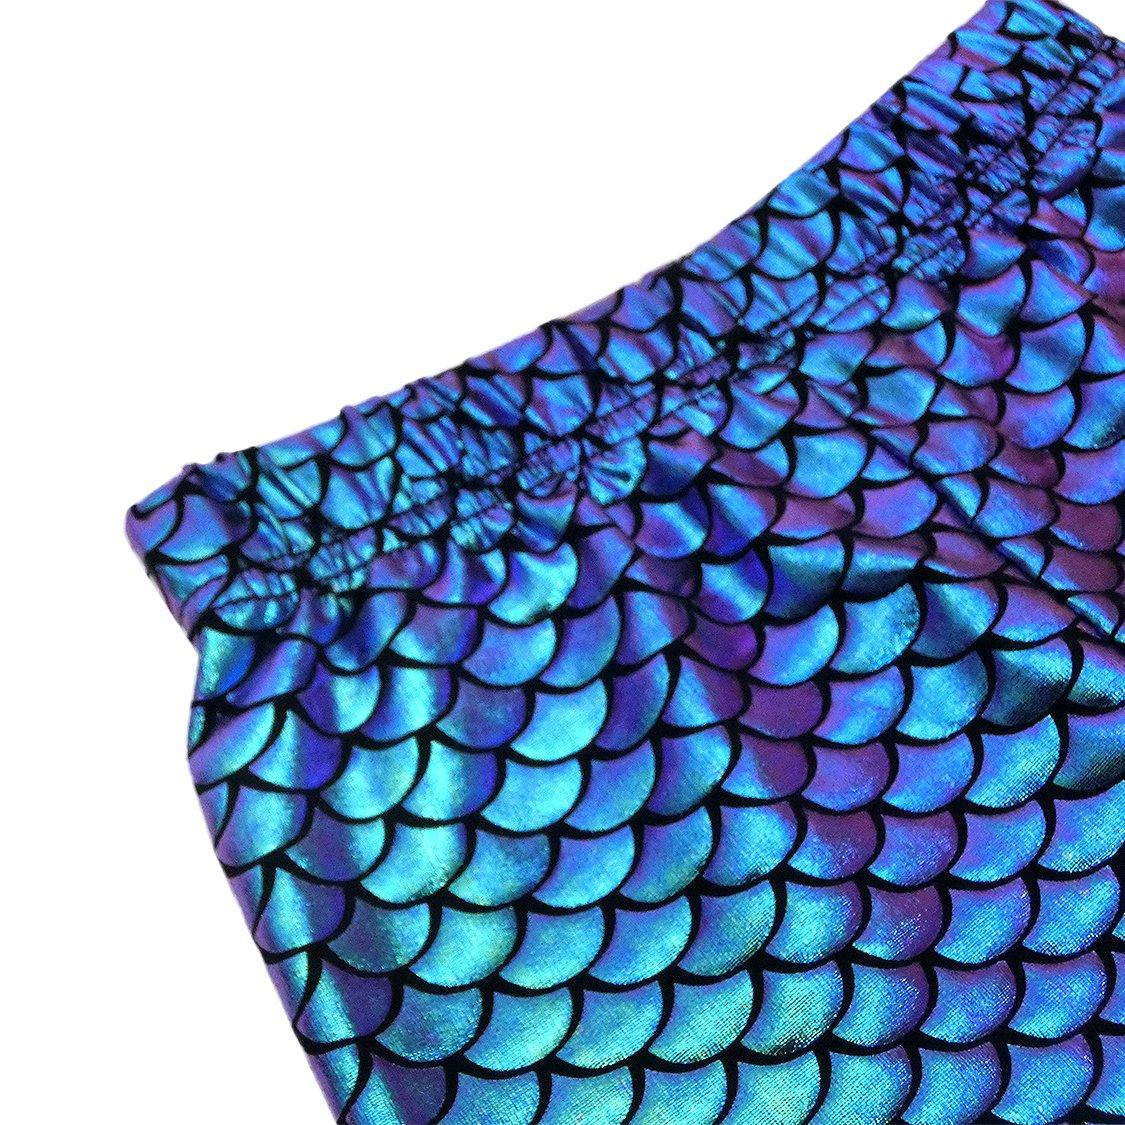 VIEWIM Toddler Baby Girls Clothes Mermaid Fish Stretch Long Leggings Pants 1-5 Years by VIEWIM (Image #3)